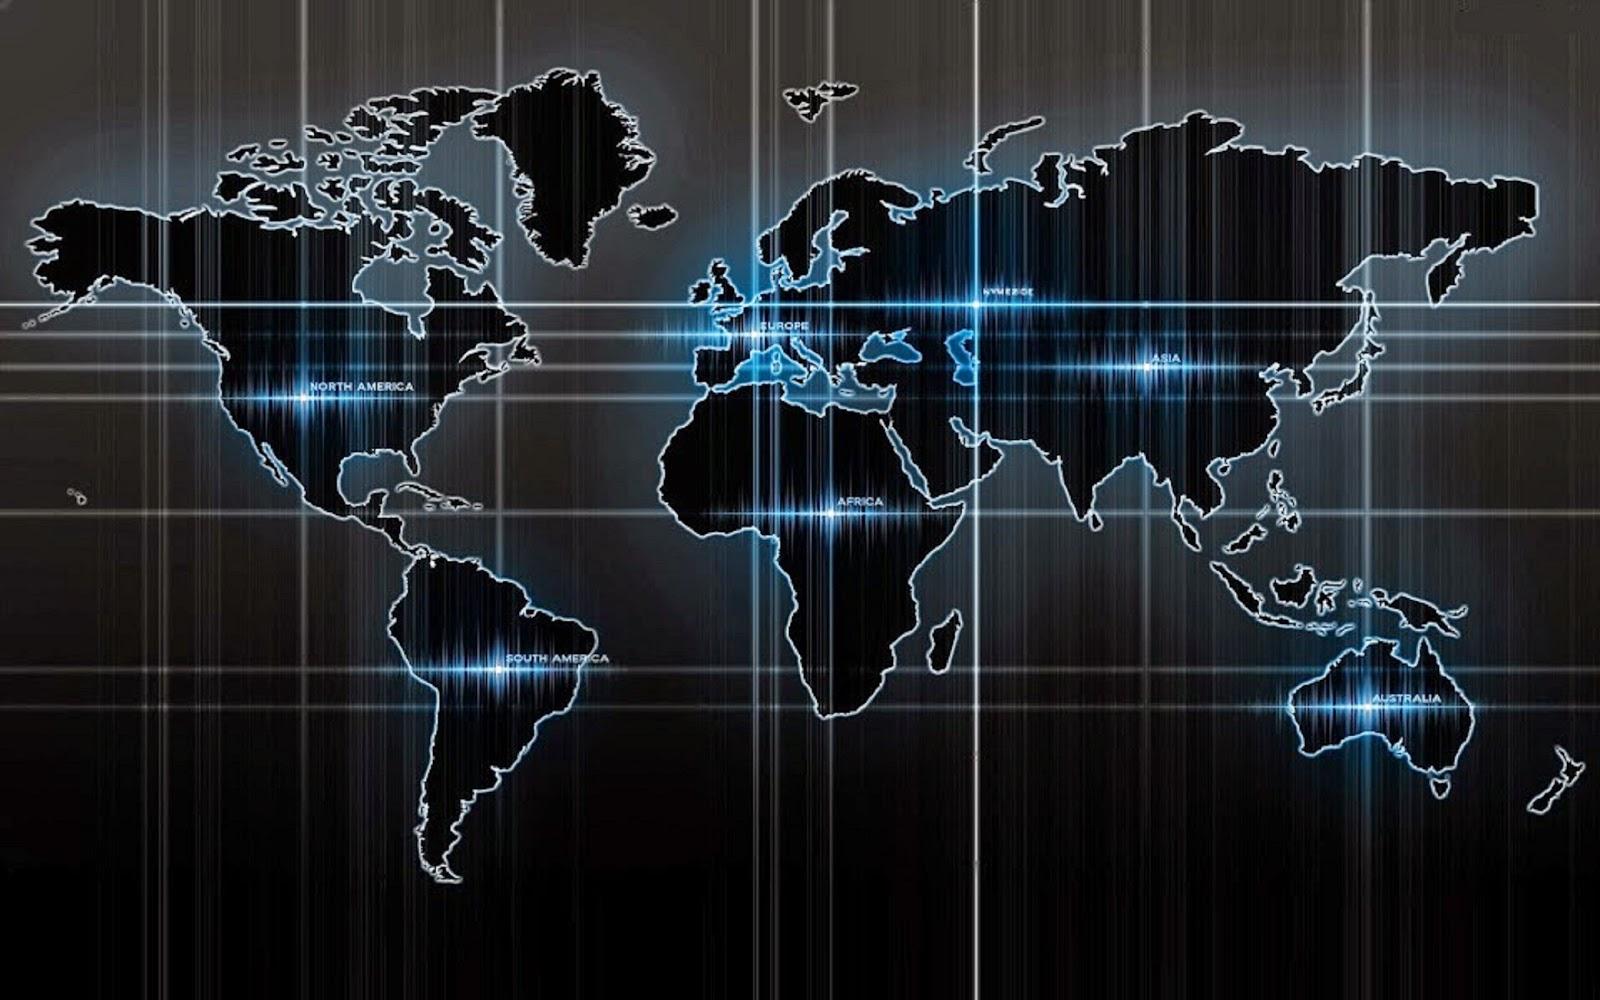 Fresh 5000 SQLi Vulnerable sites List for Hacking latest 2014